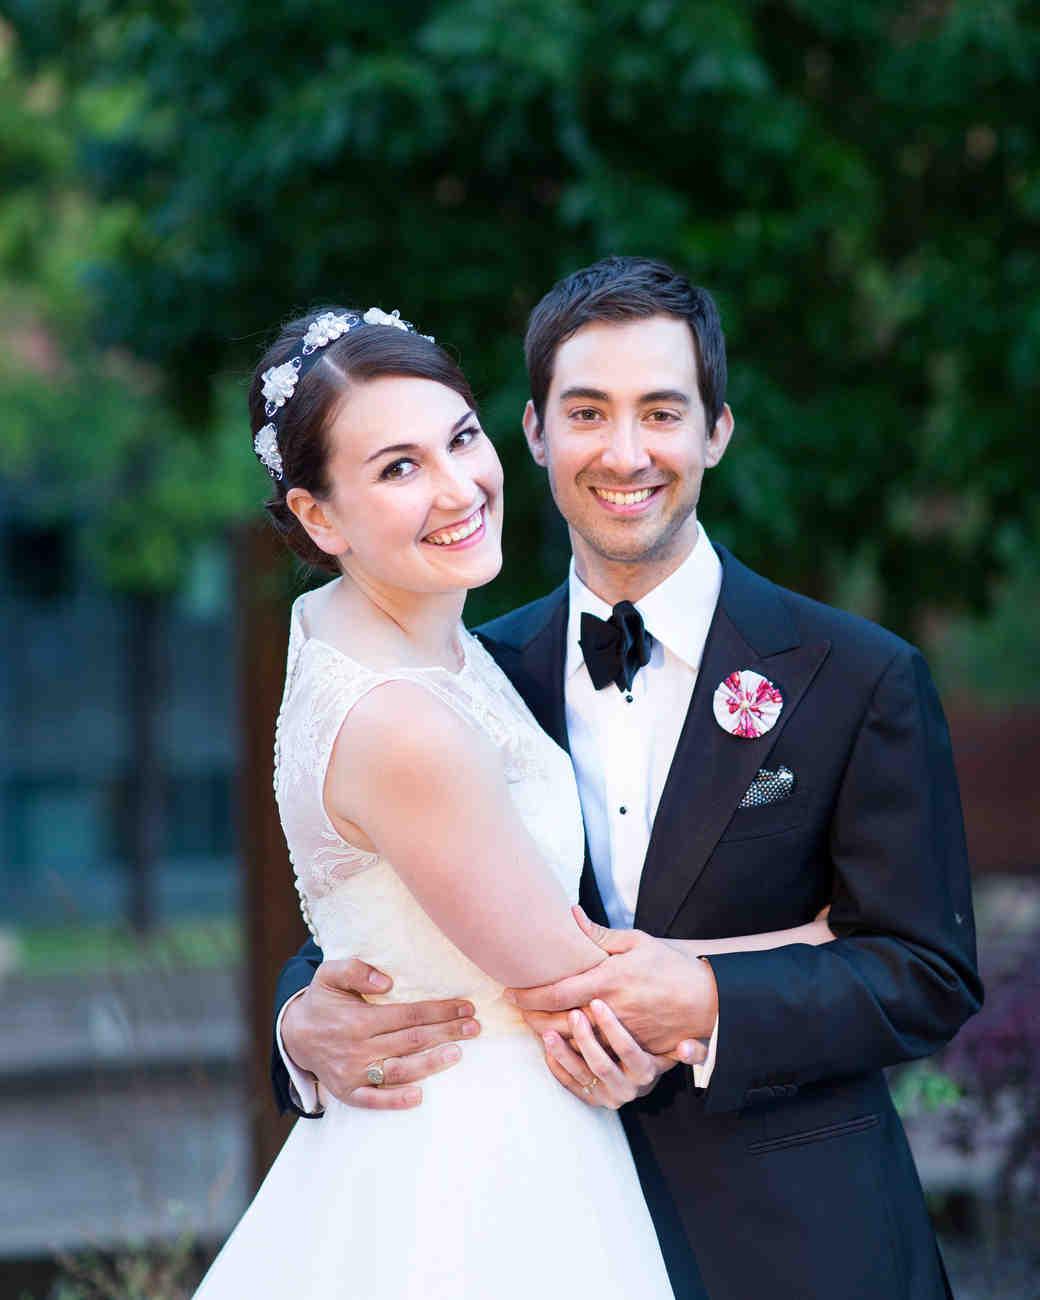 ashley-ryan-wedding-couple-11574-s111852-0415.jpg